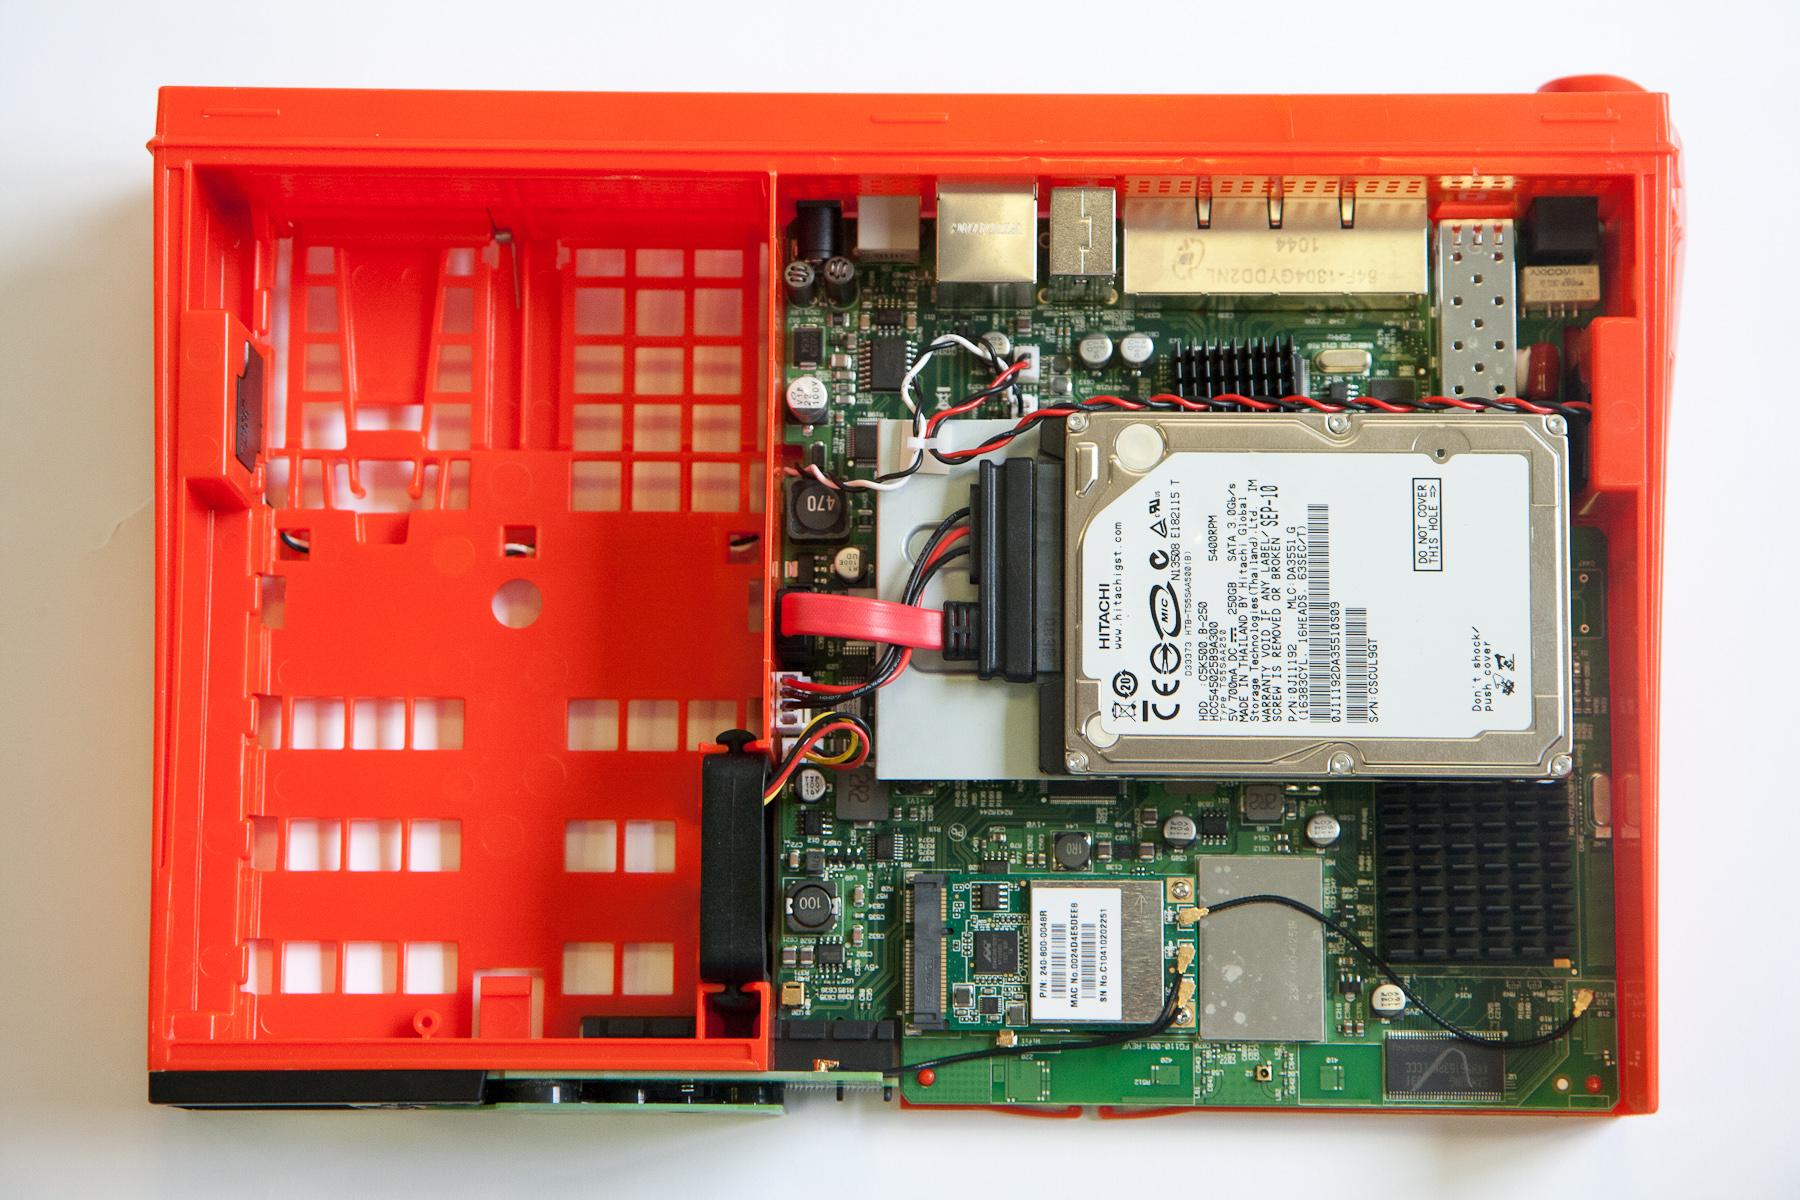 Les entrailles du freebox server - Port usb freebox revolution ...